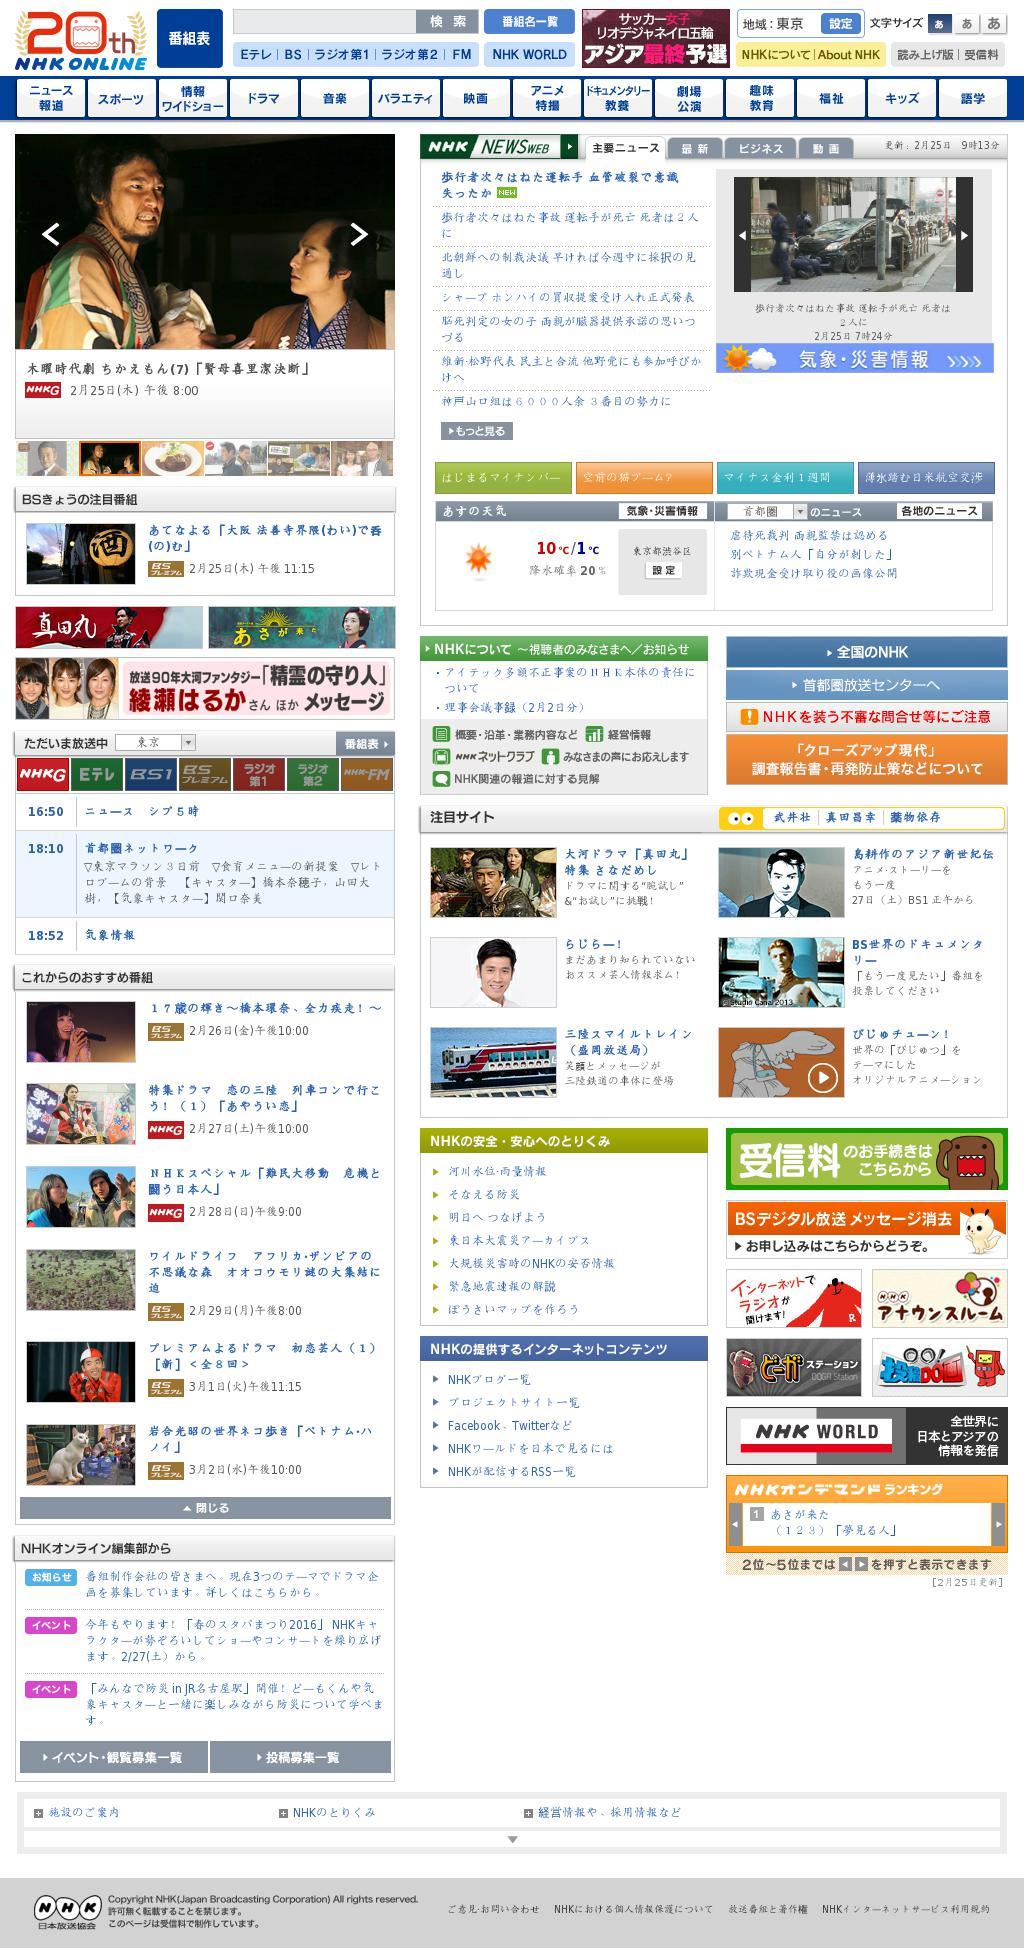 NHK Online at Thursday Feb. 25, 2016, 9:14 a.m. UTC